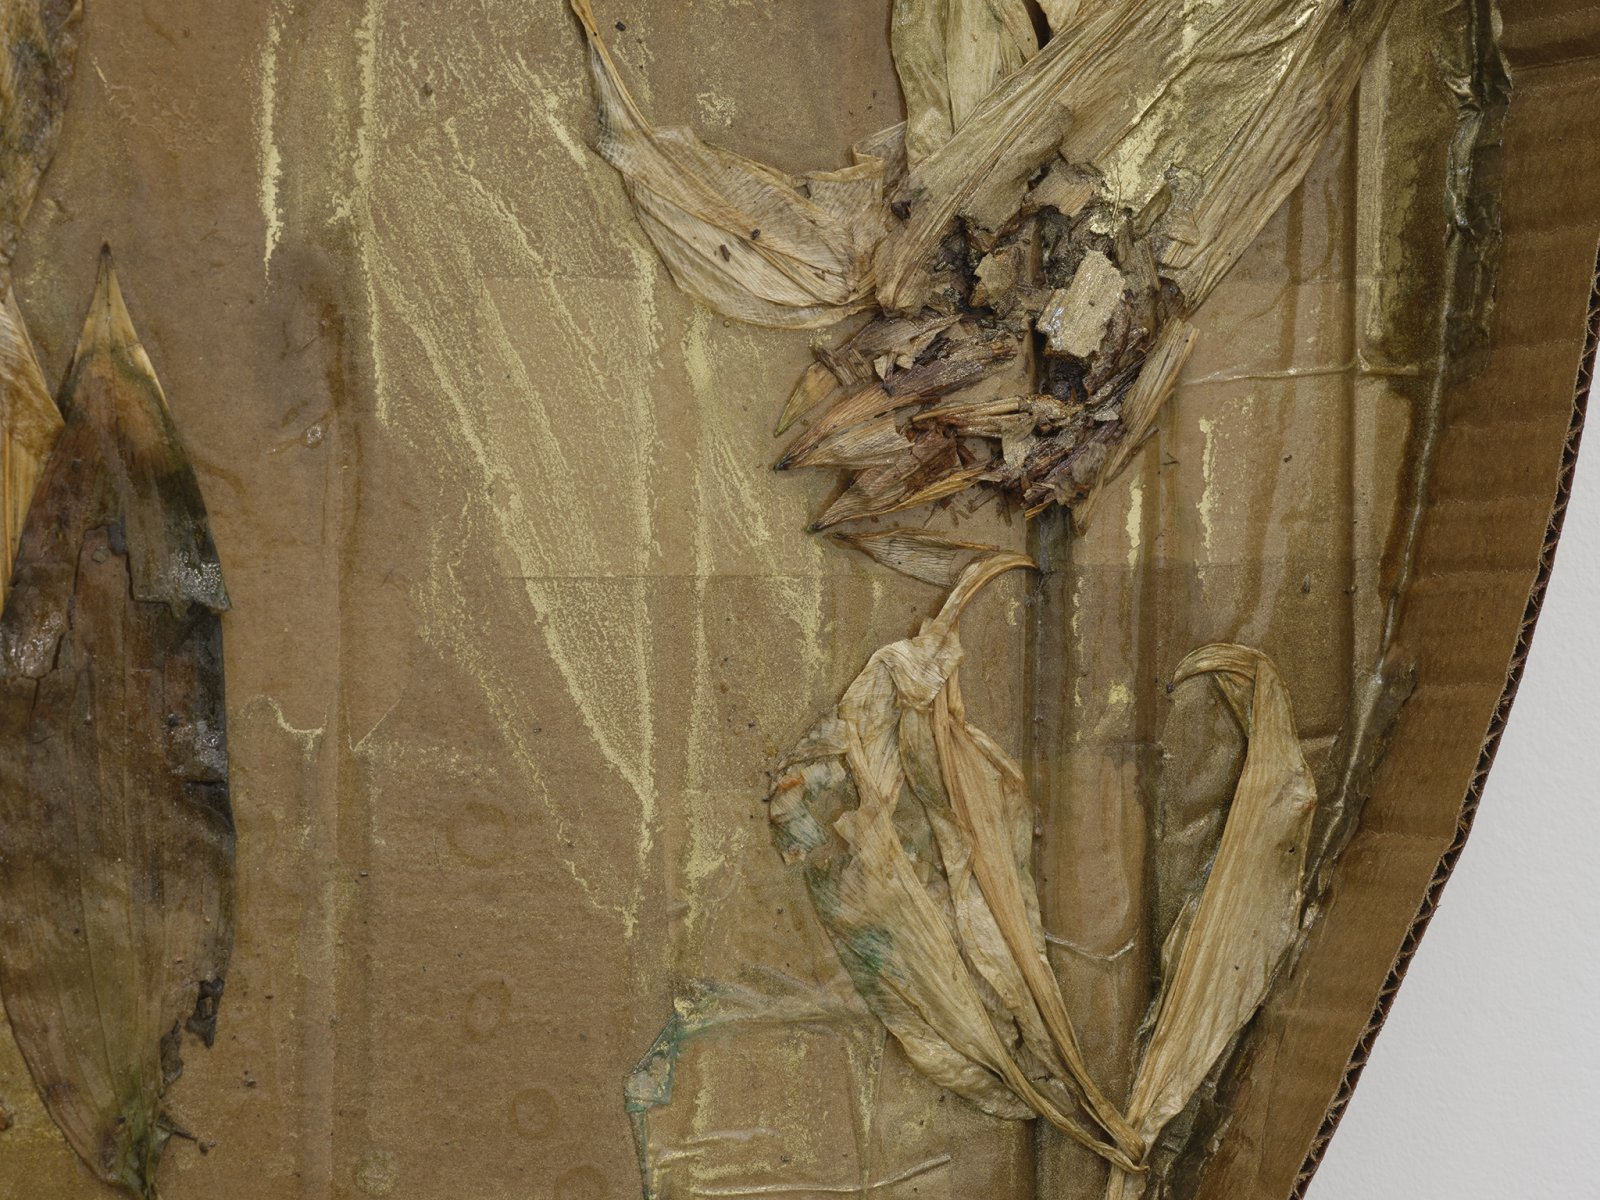 Rochelle Goldberg, Halo II (detail), 2019, cardboard, tissue paper, lilies, shellac, gold pigment, gold tape, dirt, 27 x 27 x 3 in. (67 x 67 x 6 cm) by Rochelle Goldberg